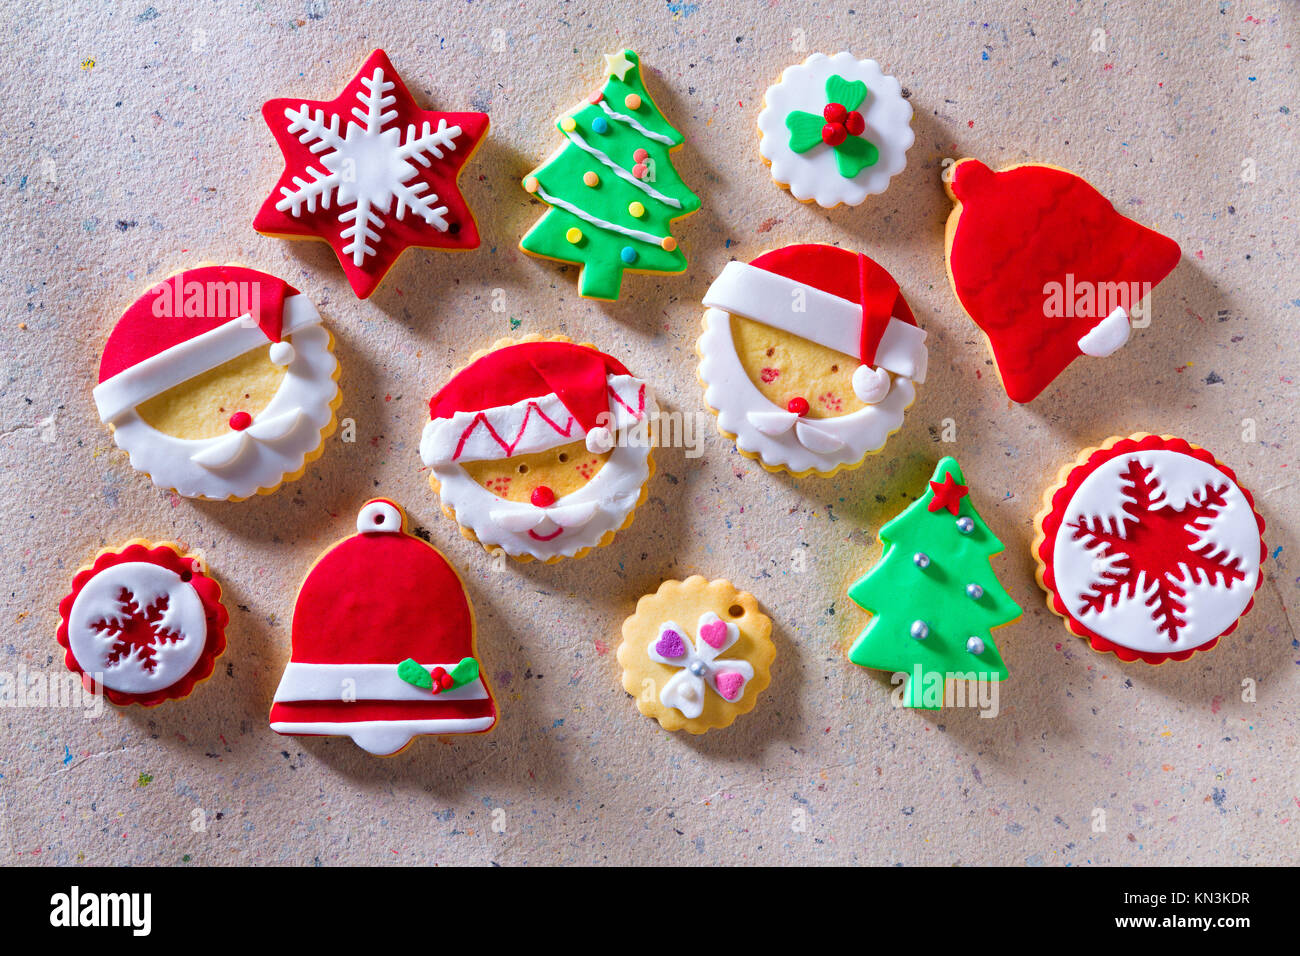 Christmas Cookies Xmas Tree Santa Snowflake On Recycled Paper Stock